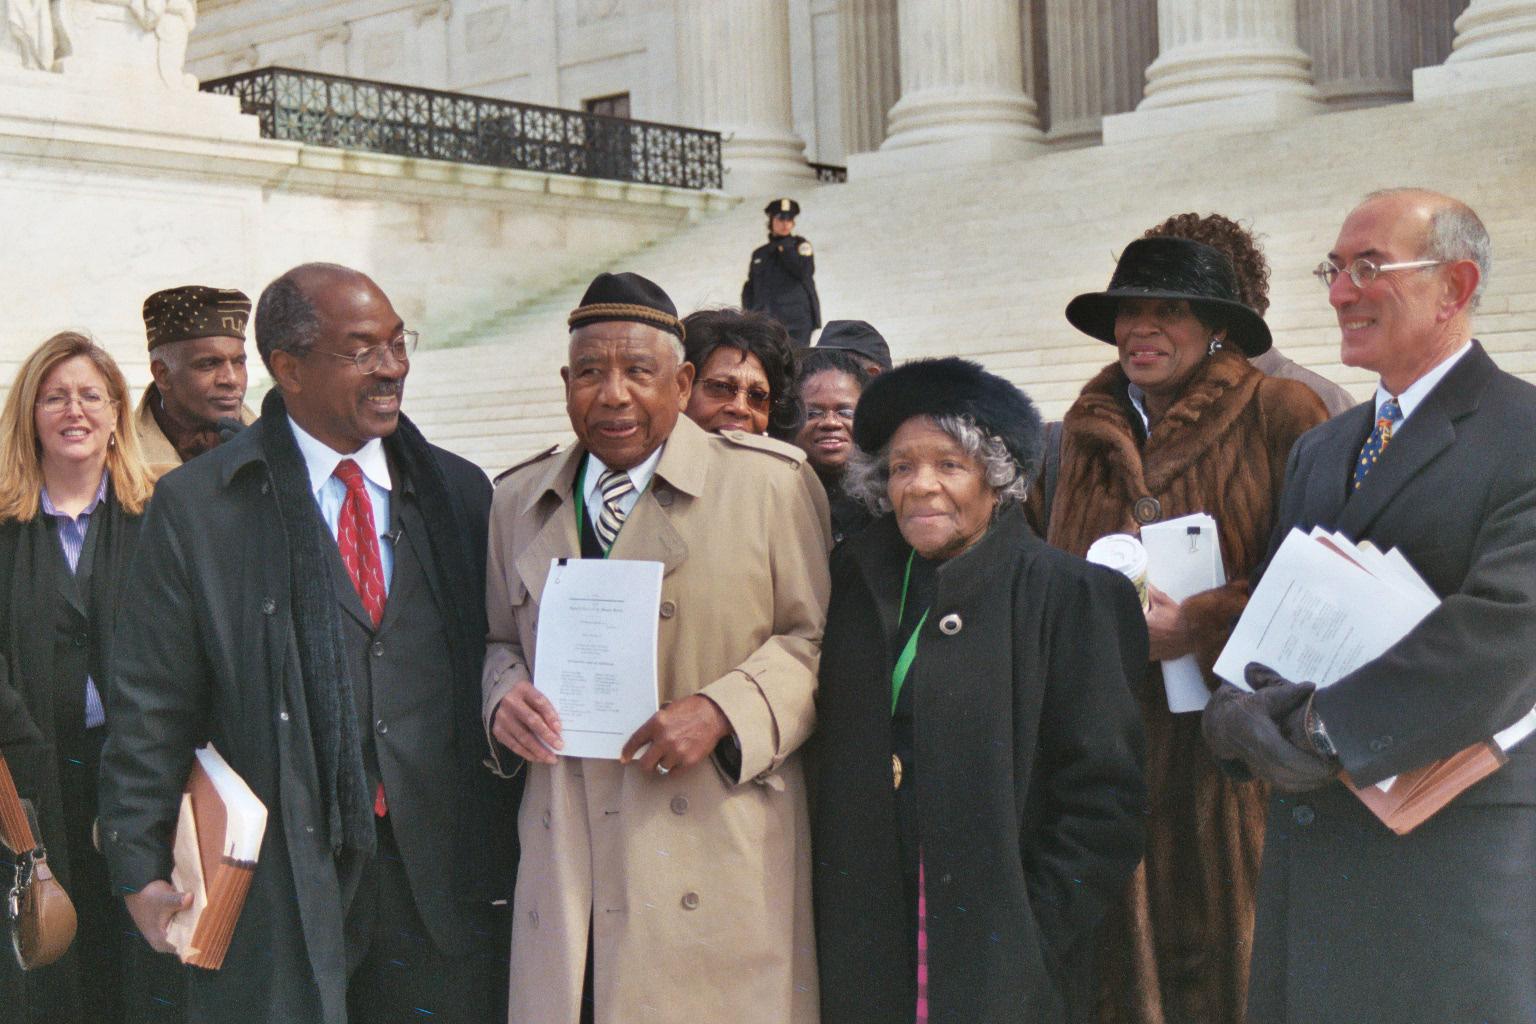 Tulsa Race Riot Survivors at the Supreme Court Charles J. Ogletree